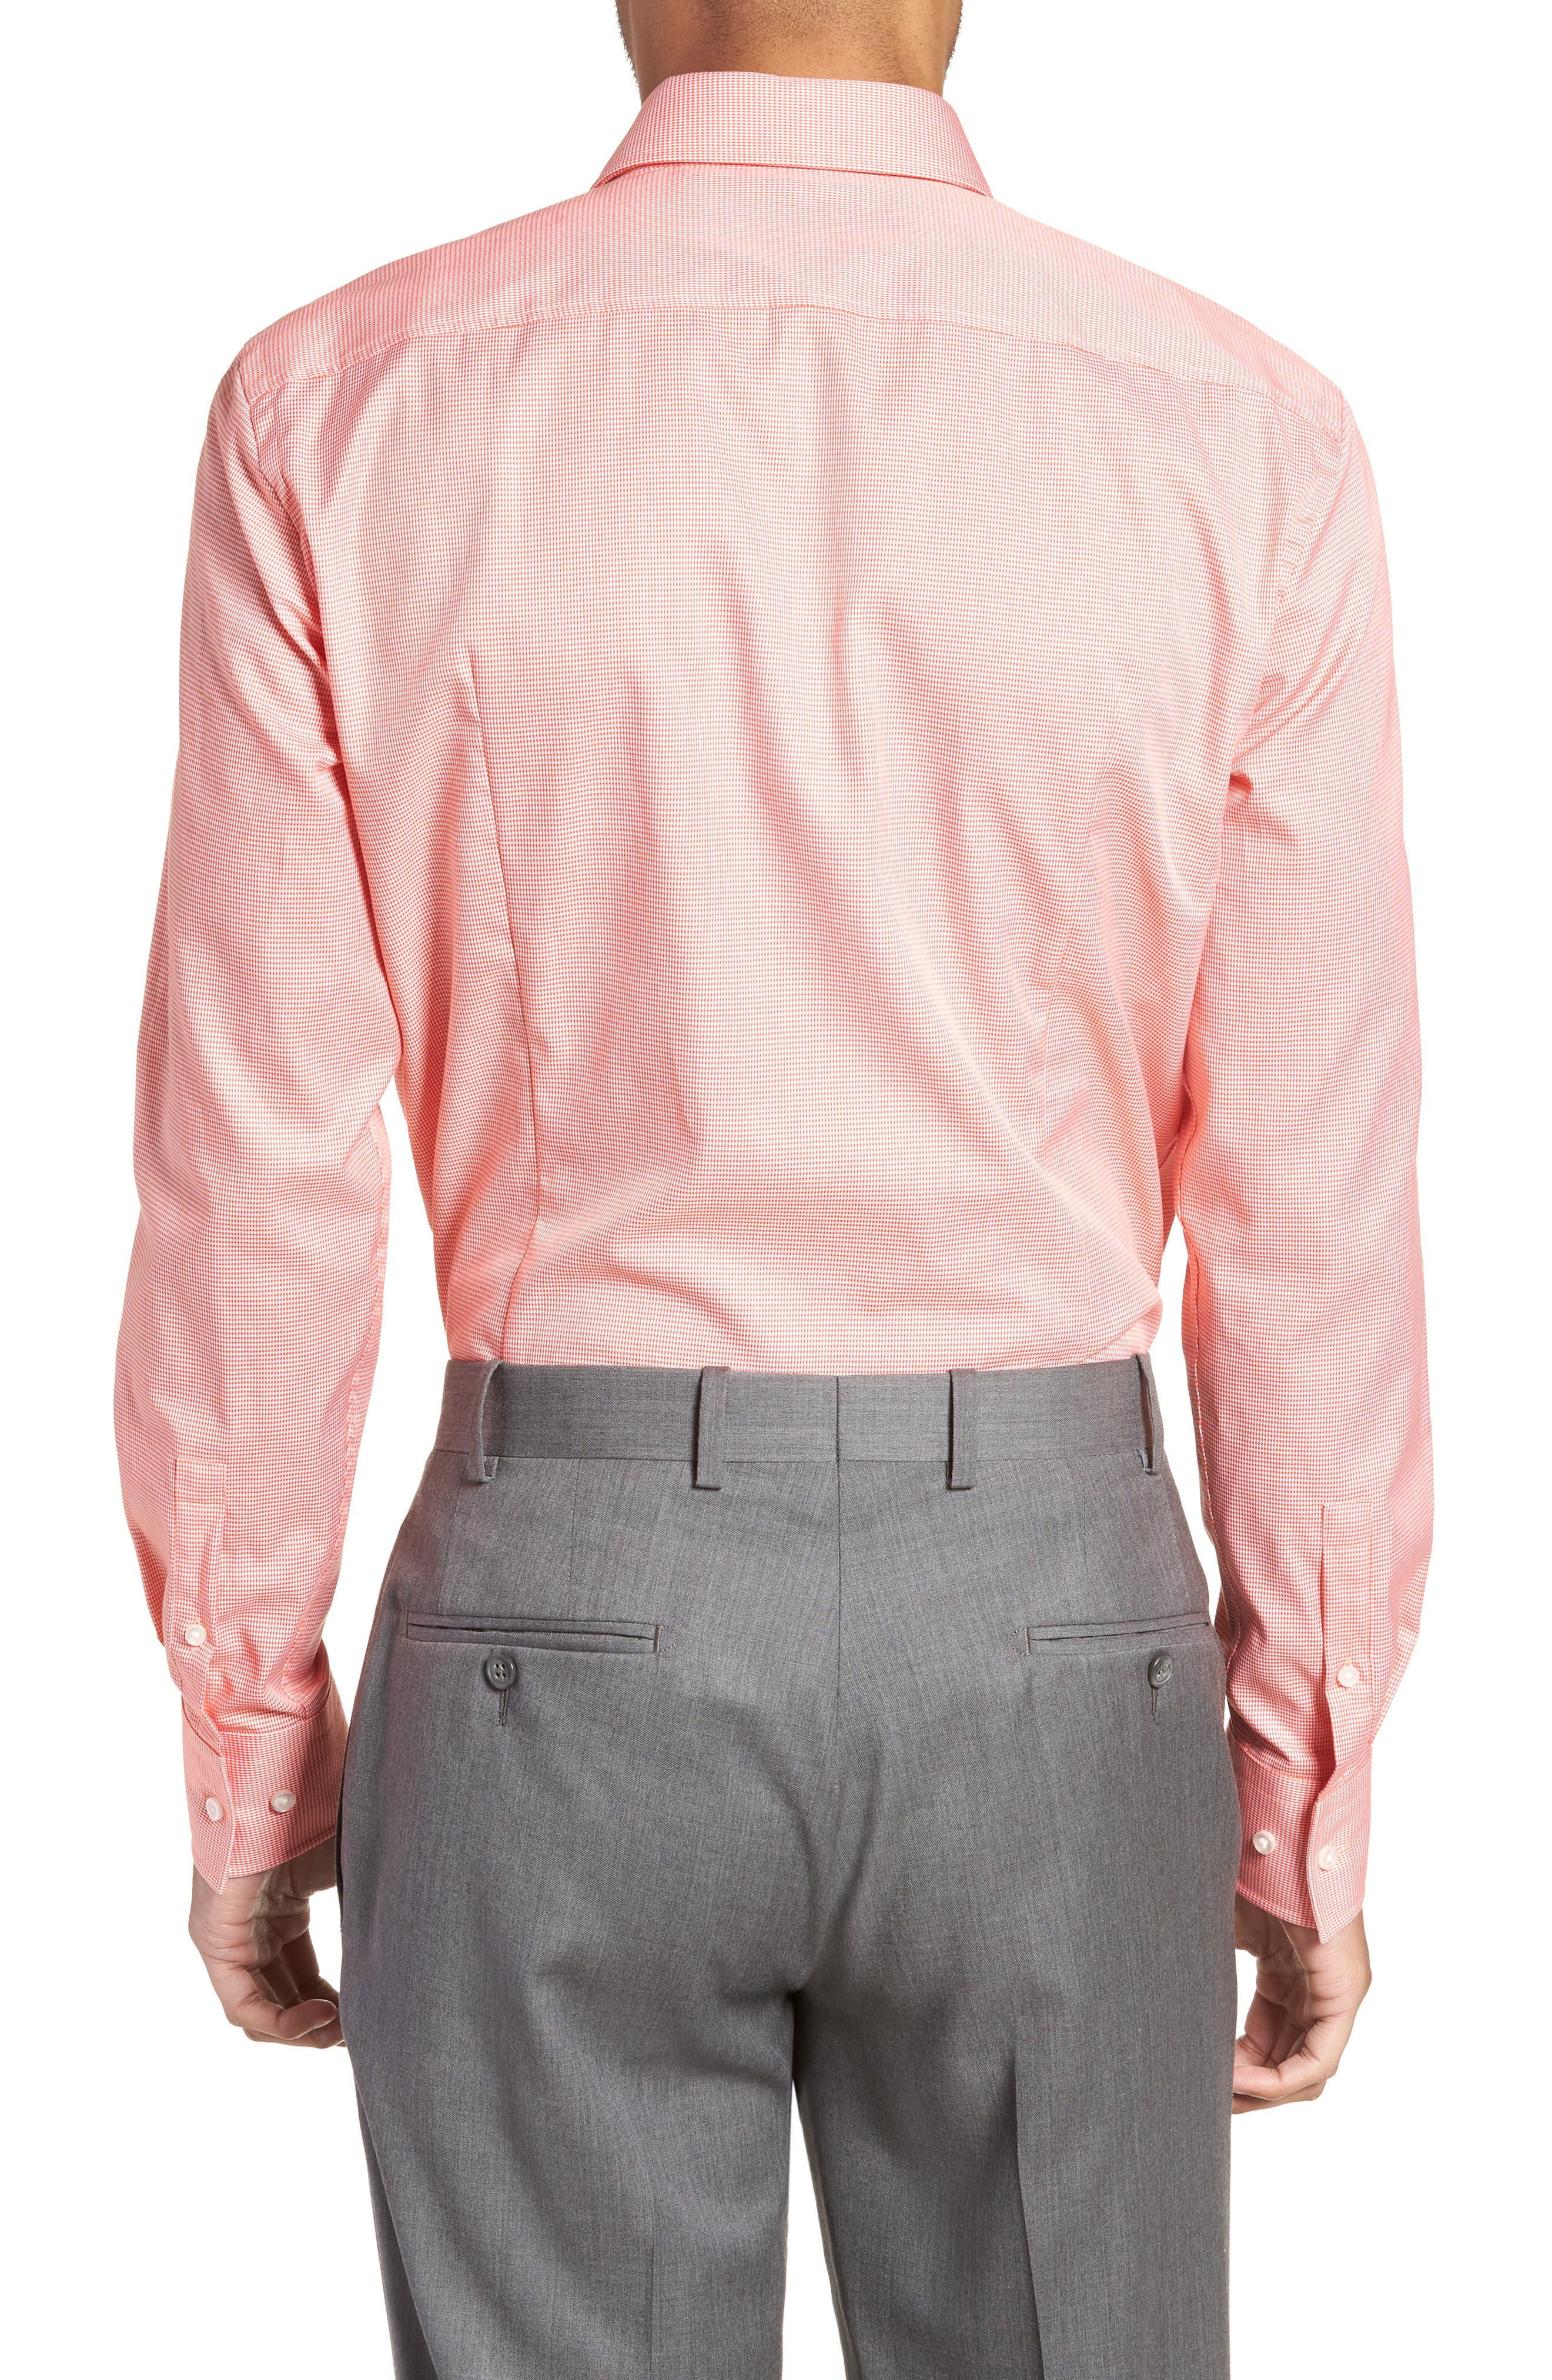 Jason Slim Fit Houndstooth Dress Shirt,                             Alternate thumbnail 3, color,                             813